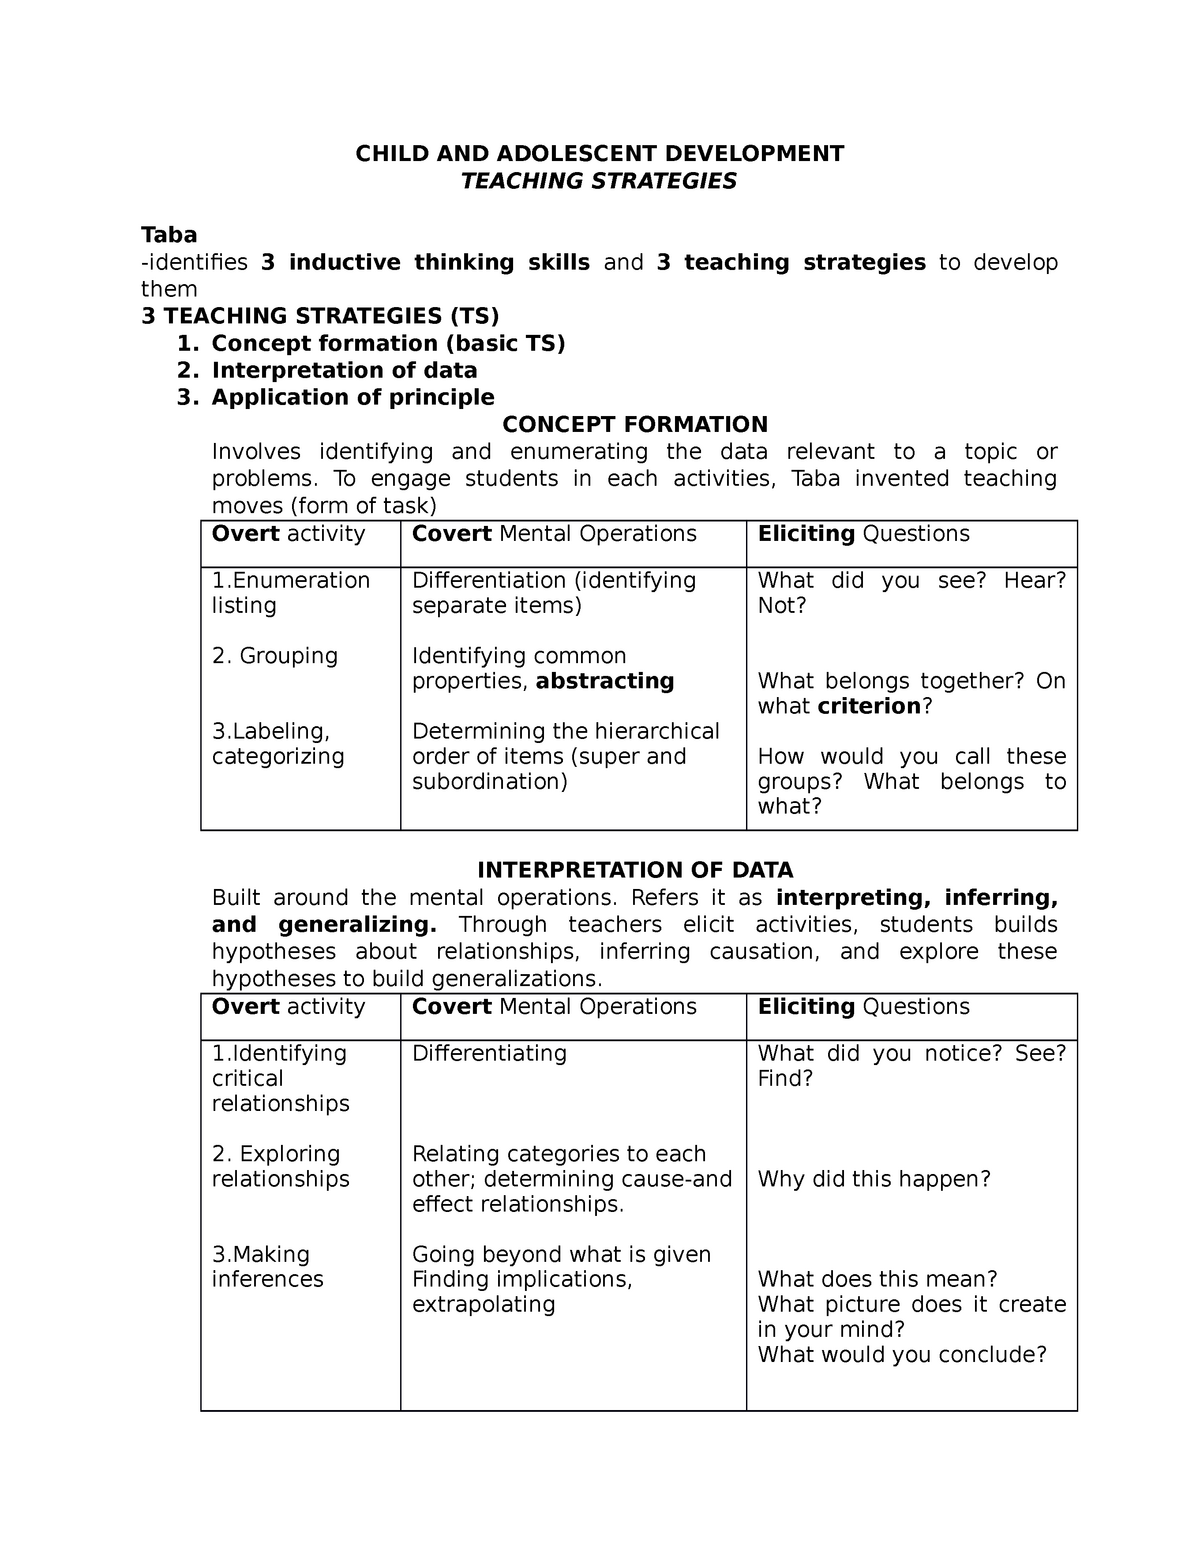 Child And Adolescent Development (Teaching Strategies) - StuDocu